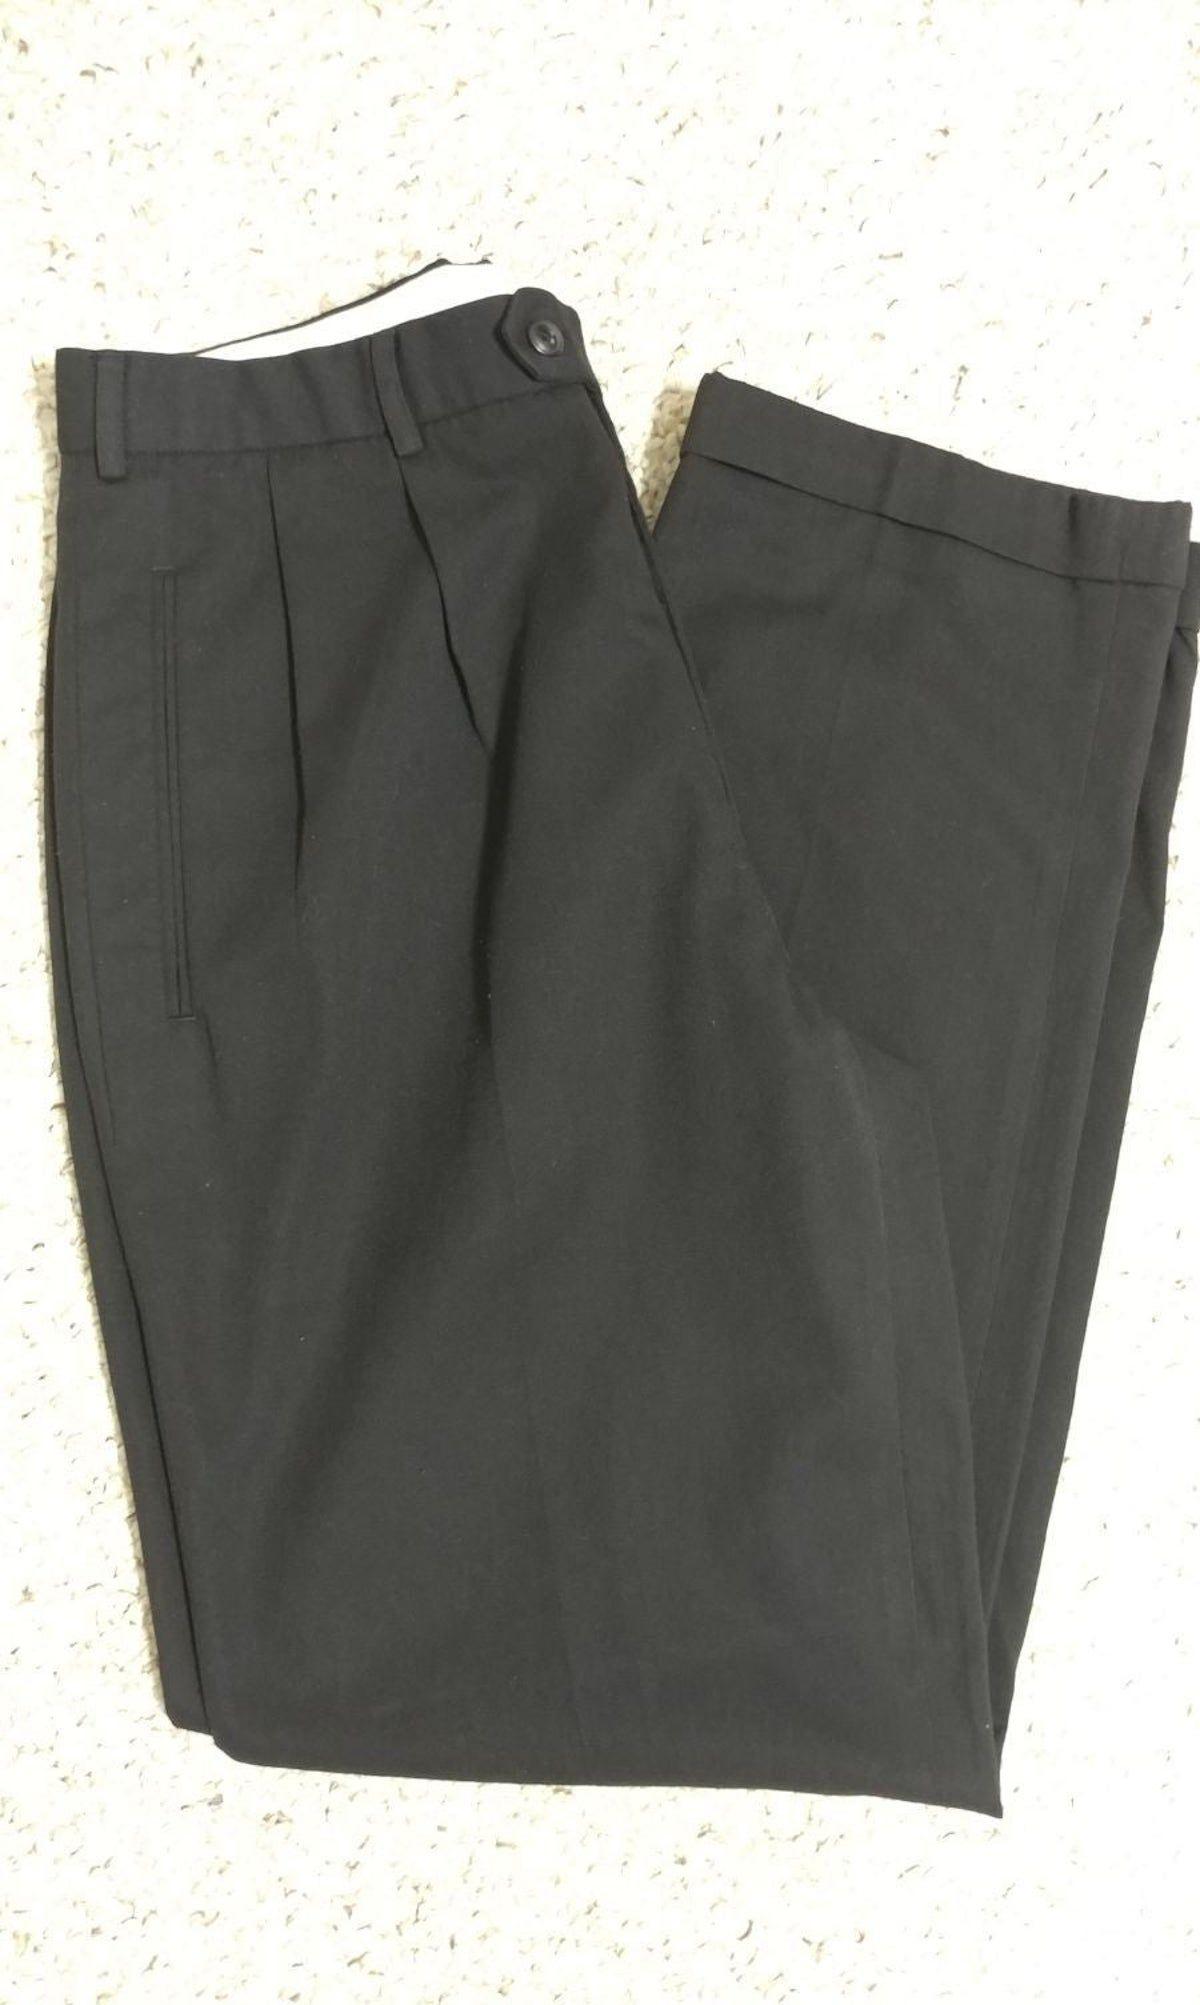 Ivy Crew Mens Dress Pants On Mercari Black Dress Pants Men Mens Dress Pants Dress Pants [ 2005 x 1200 Pixel ]